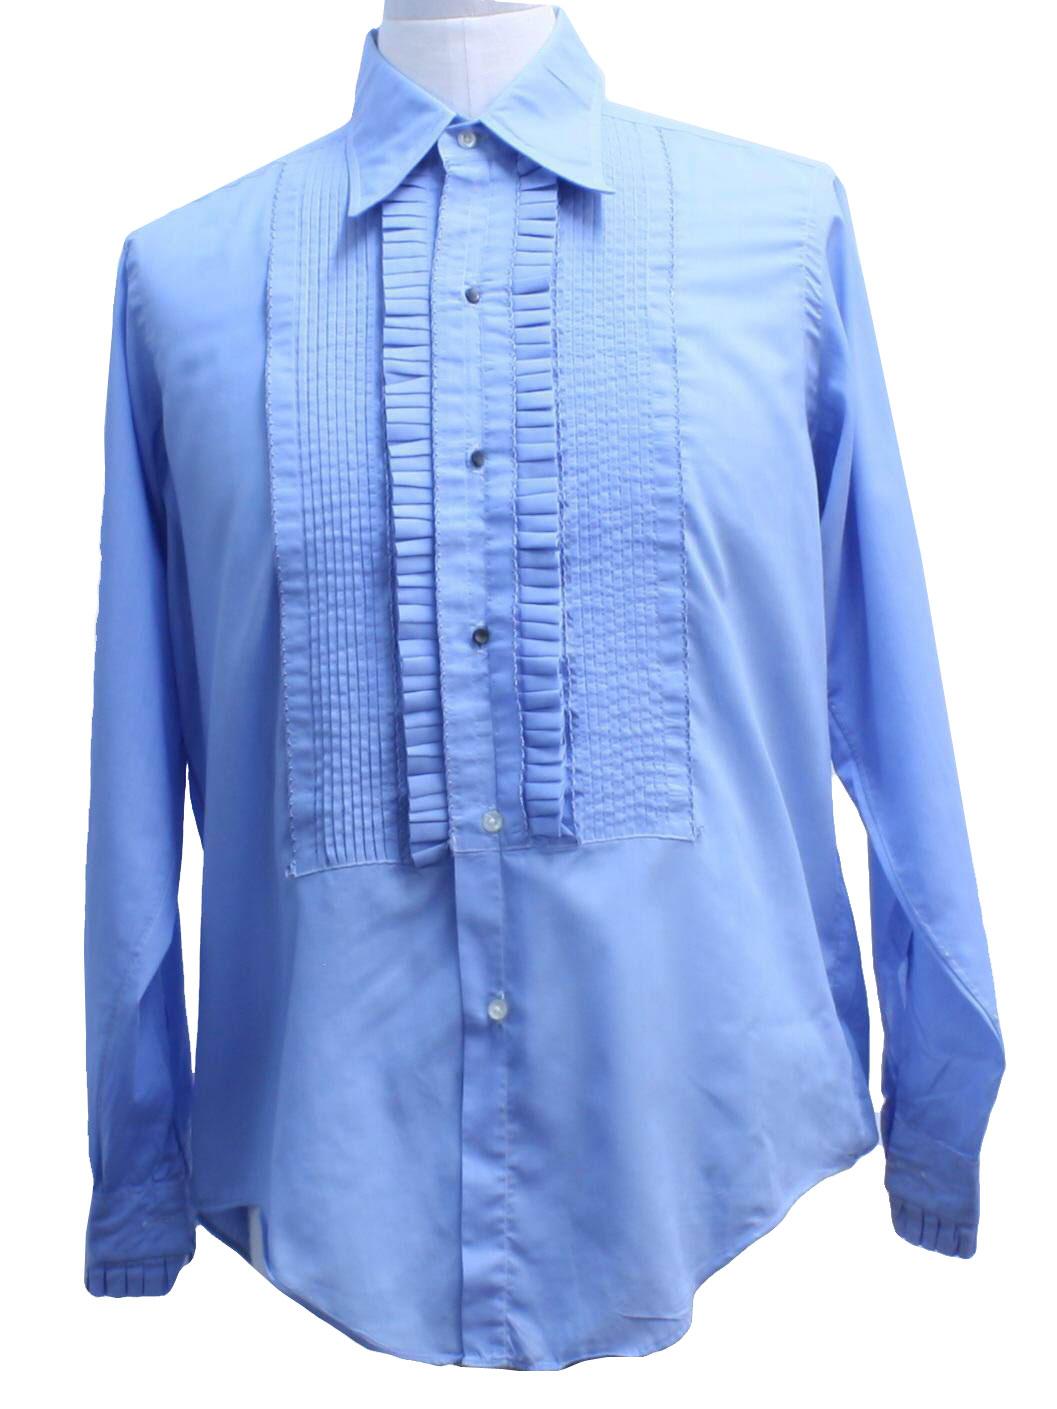 Retro 70 S Shirt 70s Turman And Reynolds Mens Baby Blue